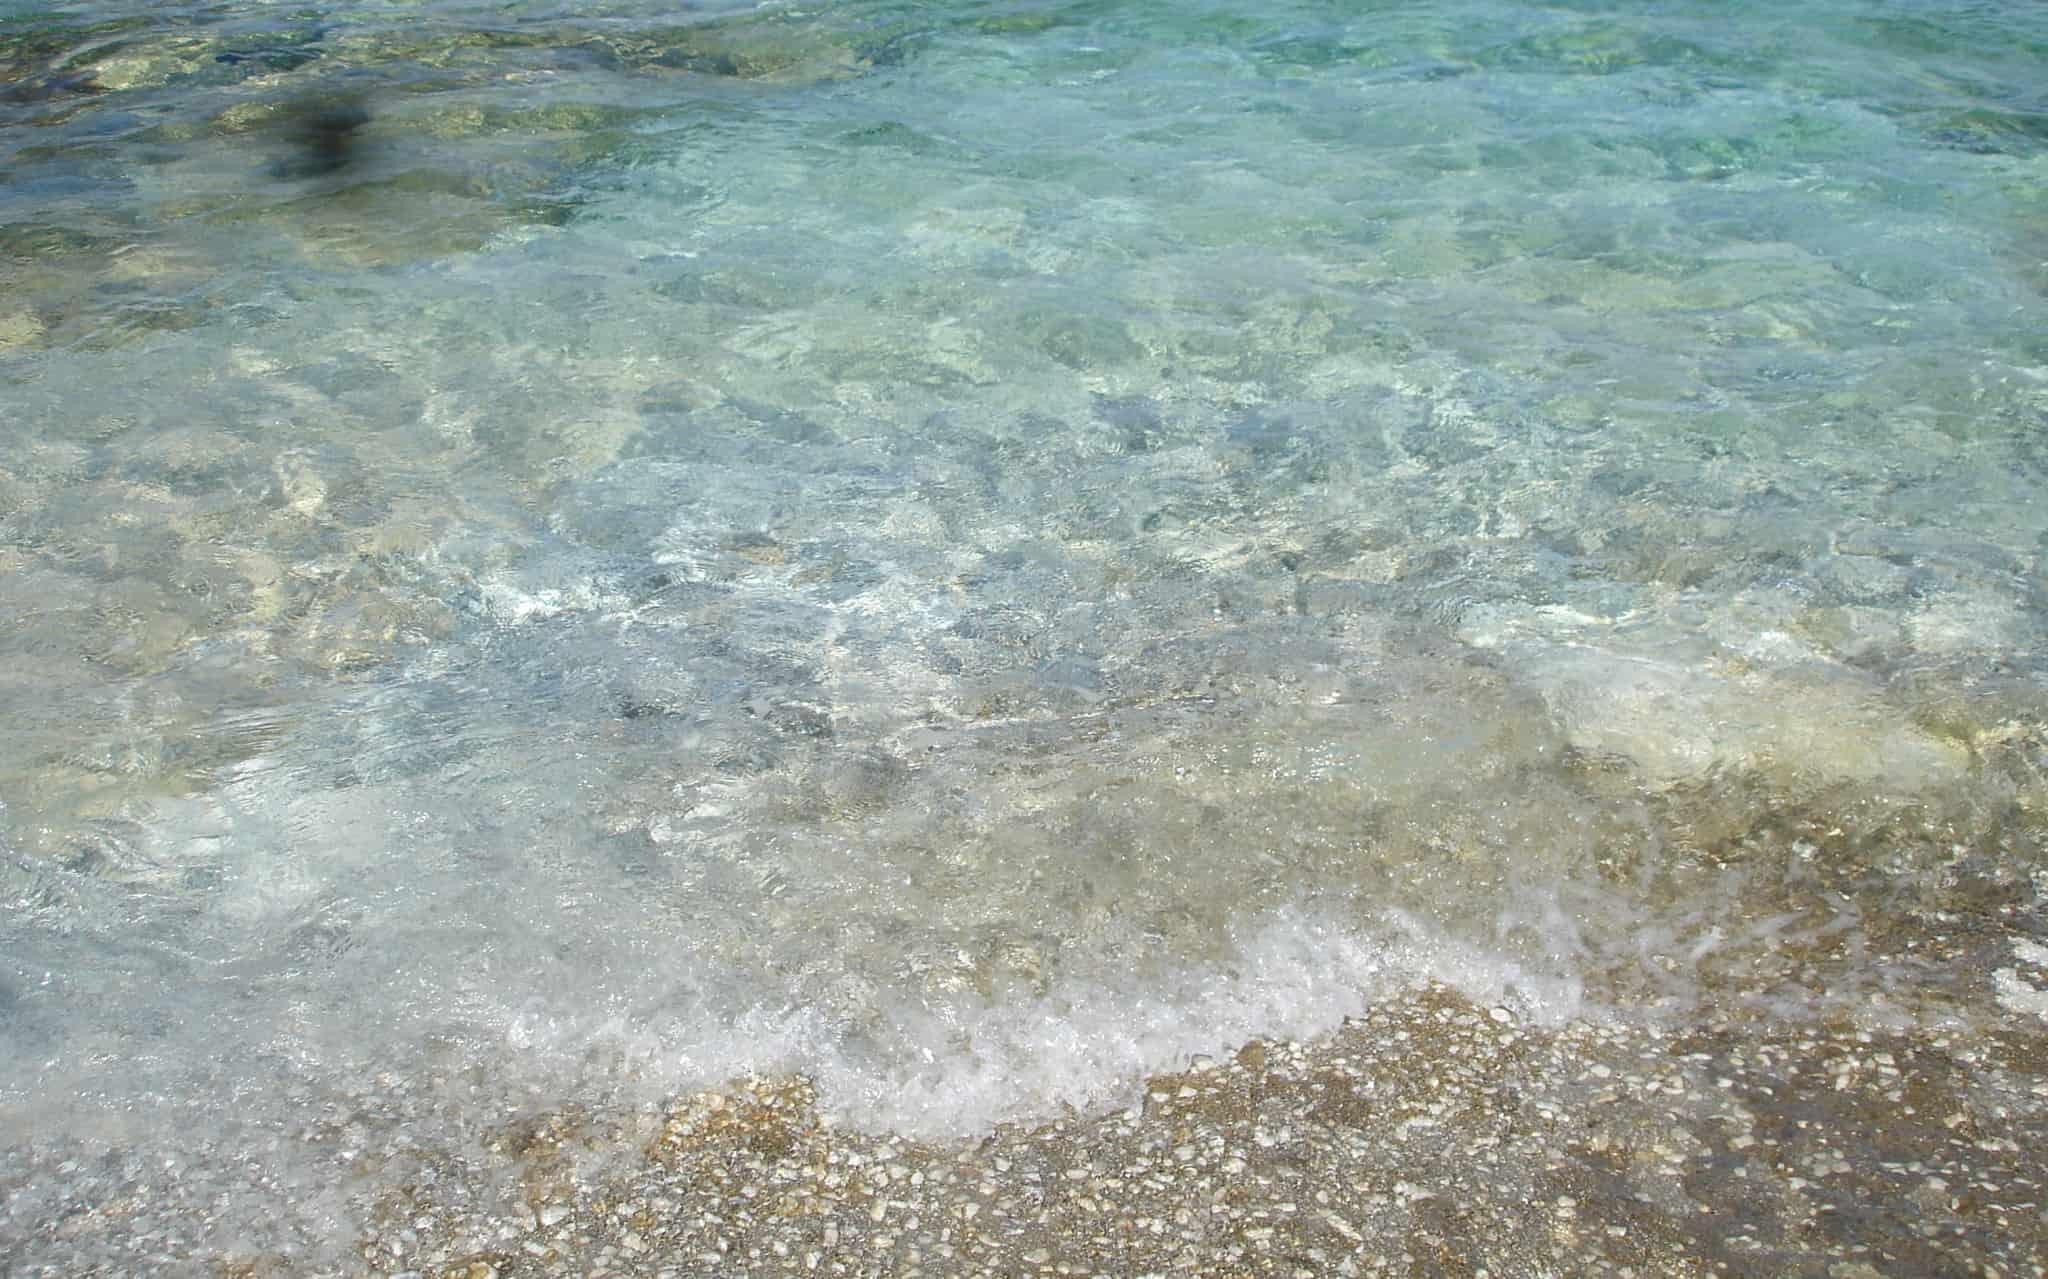 Valurile mării spărgându-se la mal